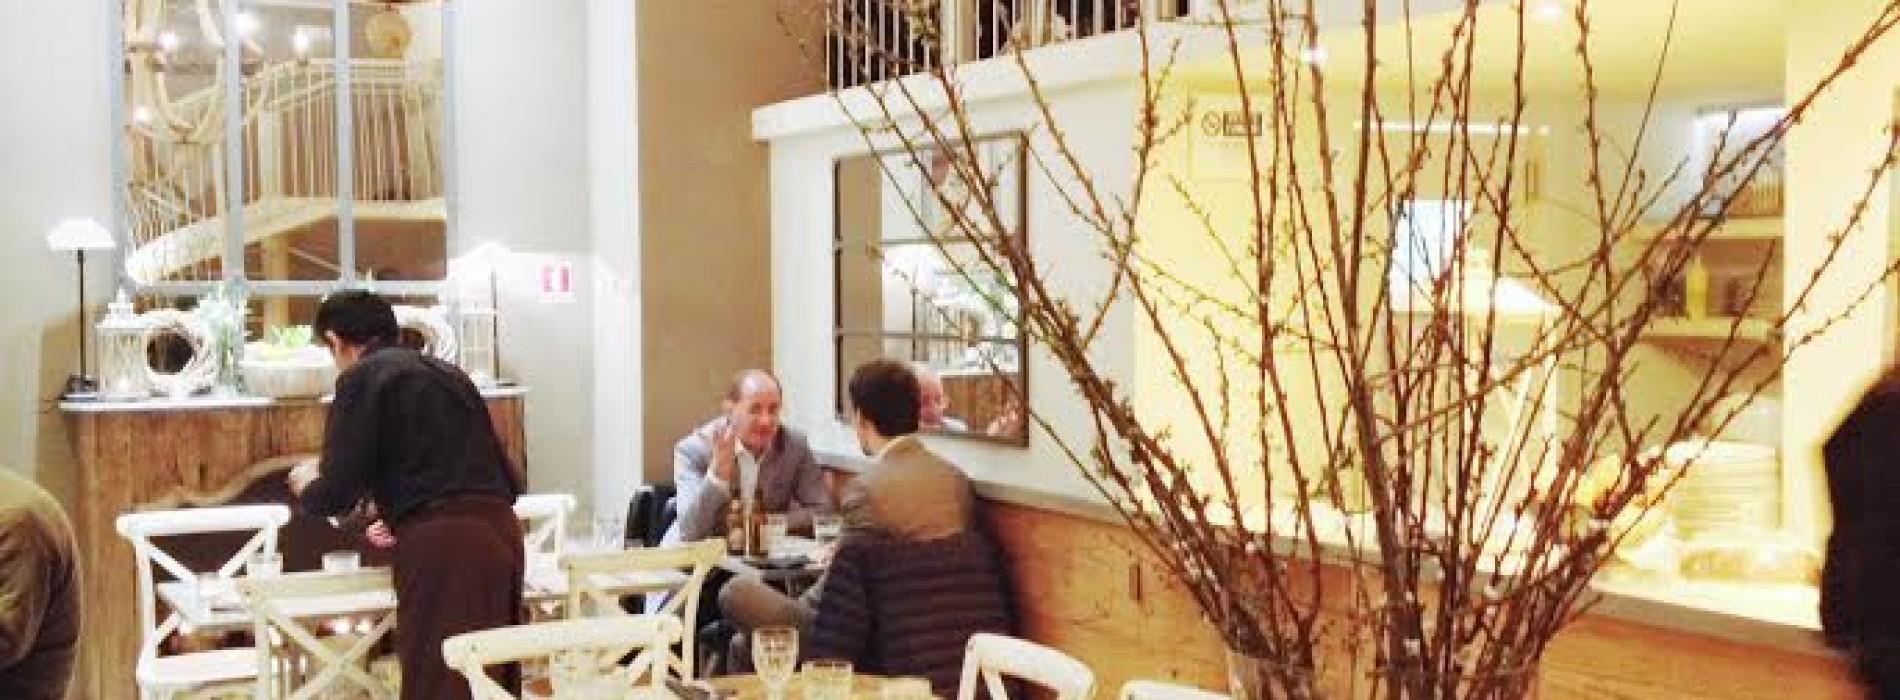 Pausa pranzo Milano zona Brera: Fiori Chiari Plates, Cinc, Drogheria San Marco, 72100, Zazà Ramen